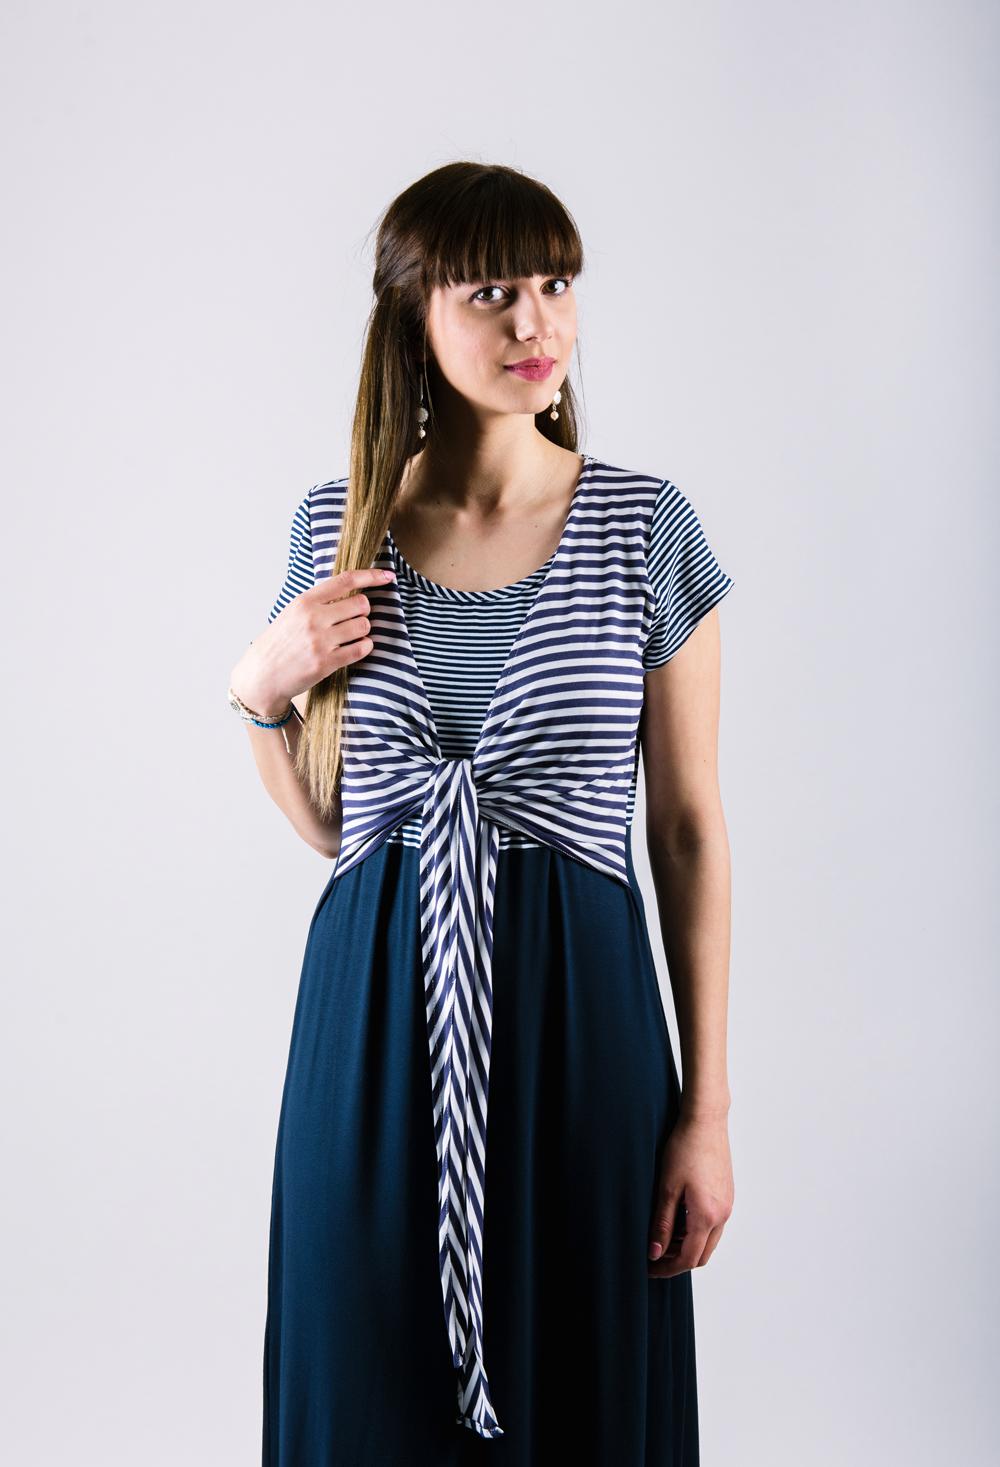 8919f450819d Φορεμα θηλασμου Nautical